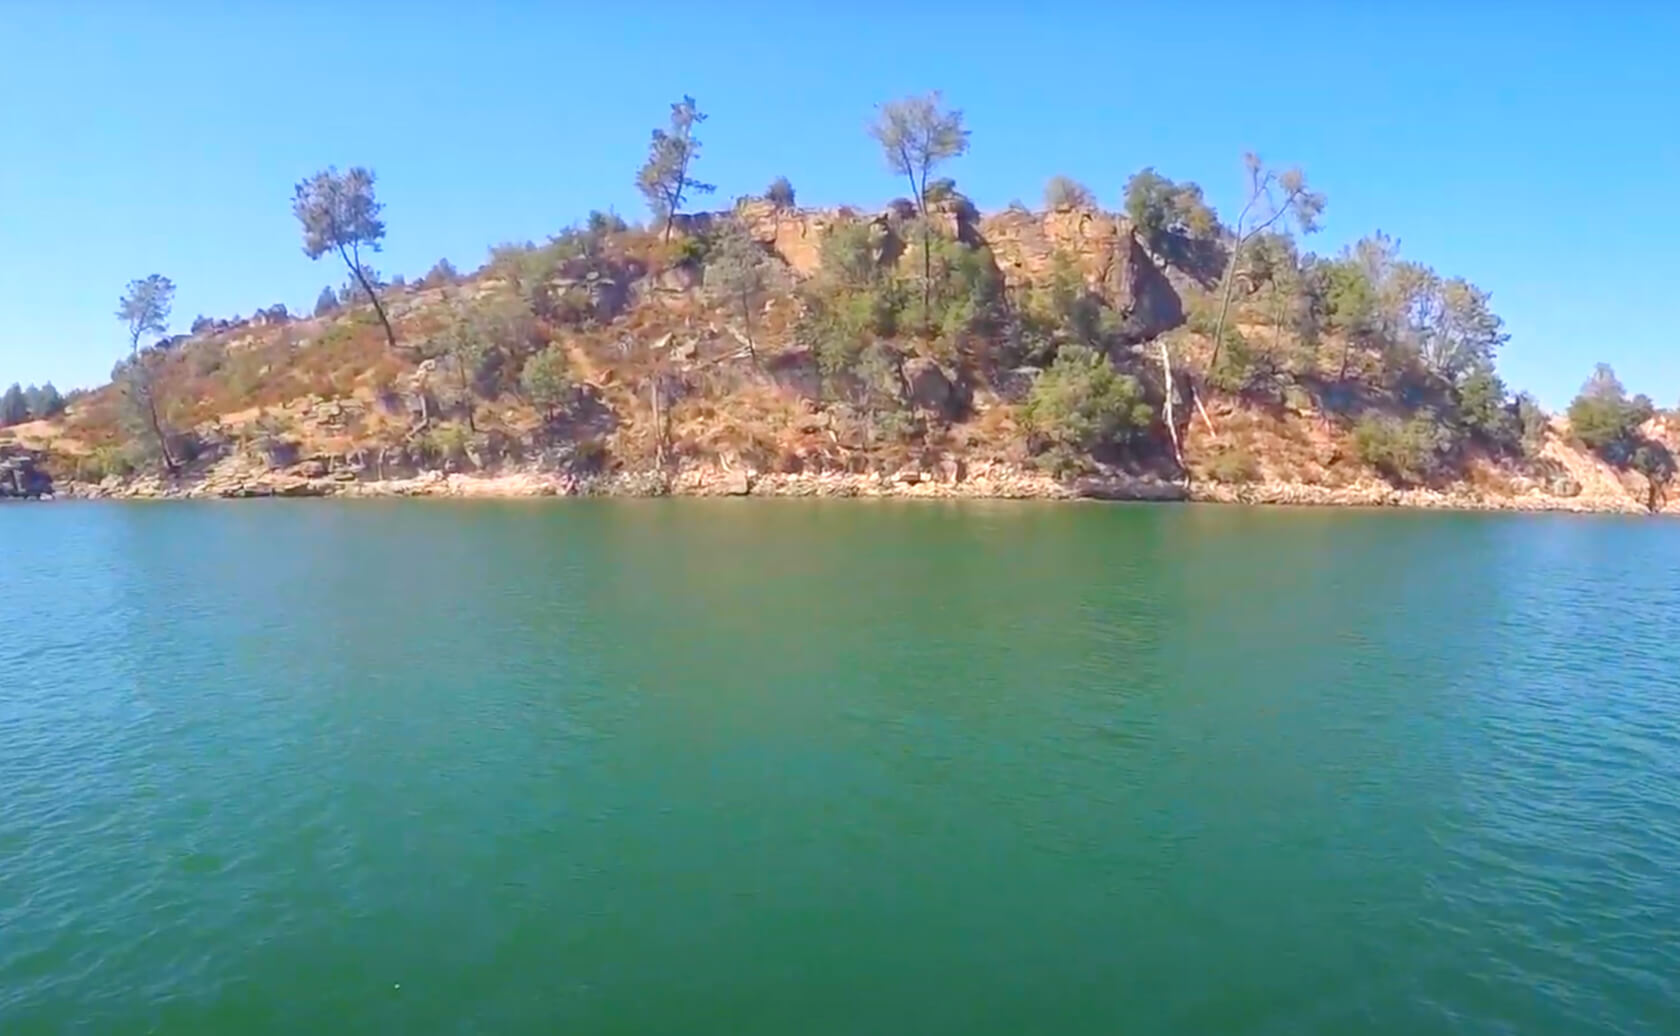 Camanche-Lake-Reservoir-Fishing-Guide-Report-California-01